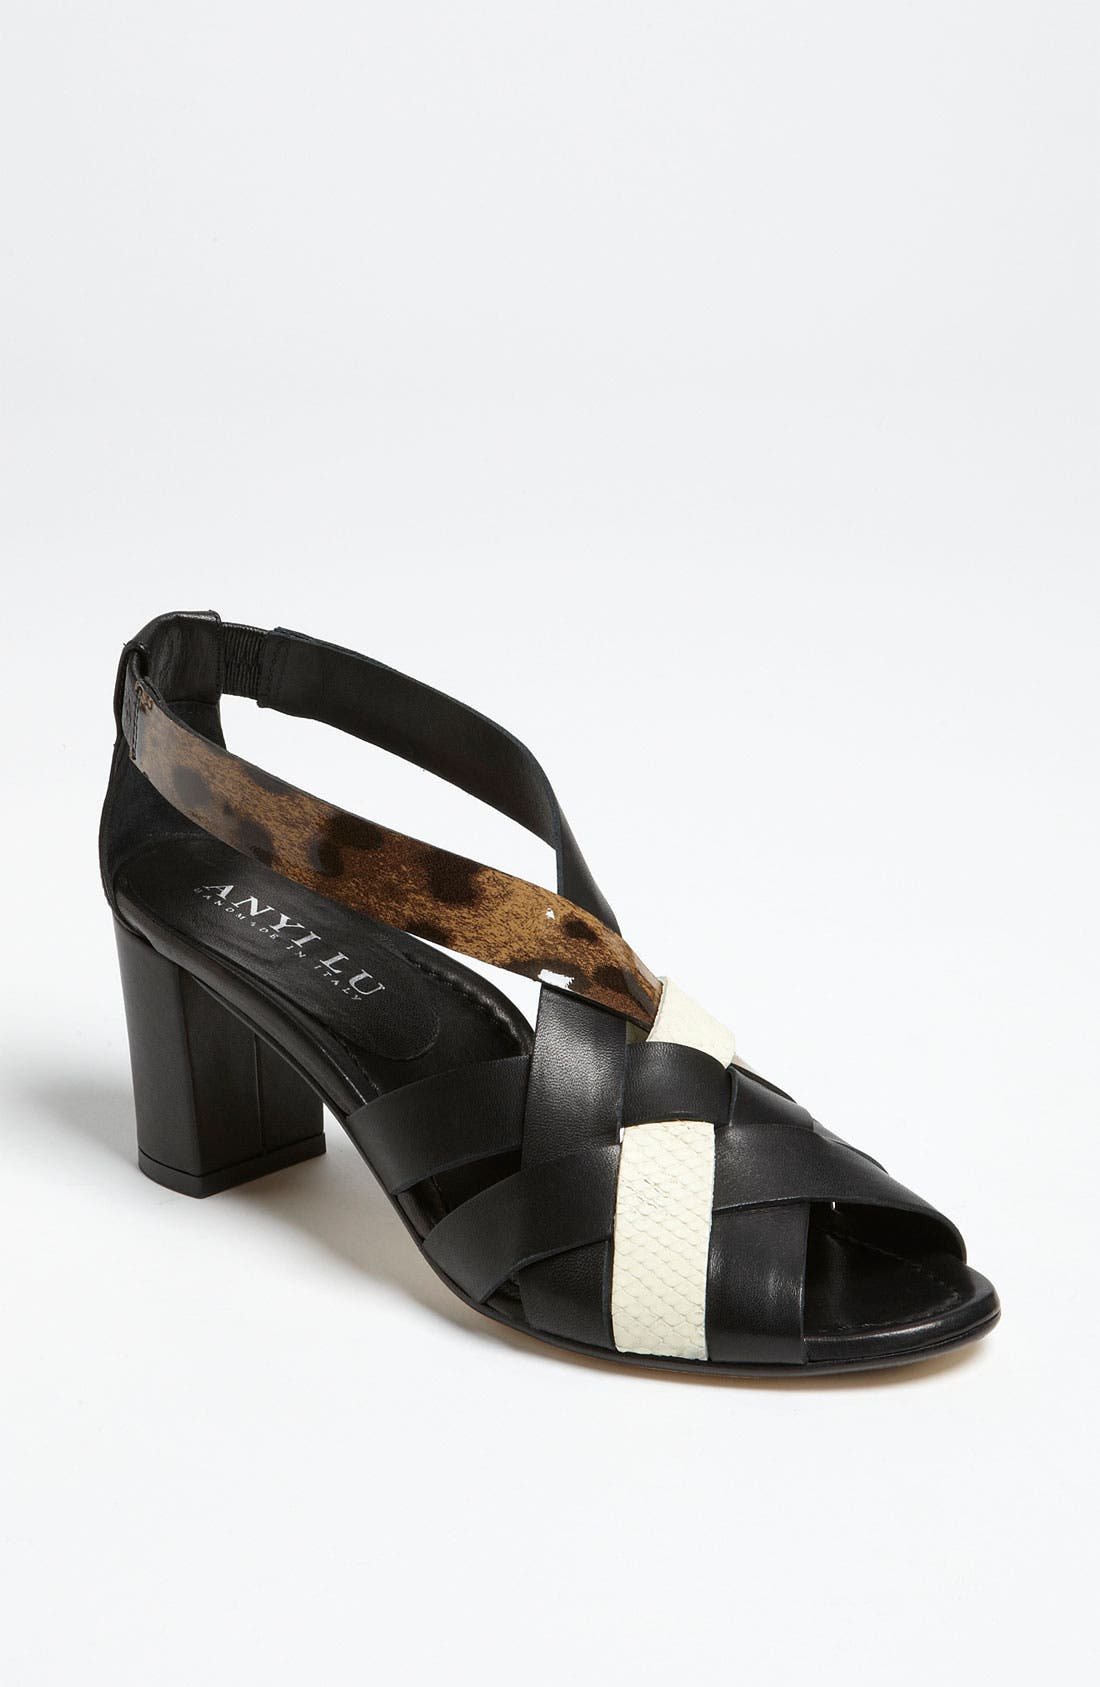 Main Image - Anyi Lu 'Mara' Sandal